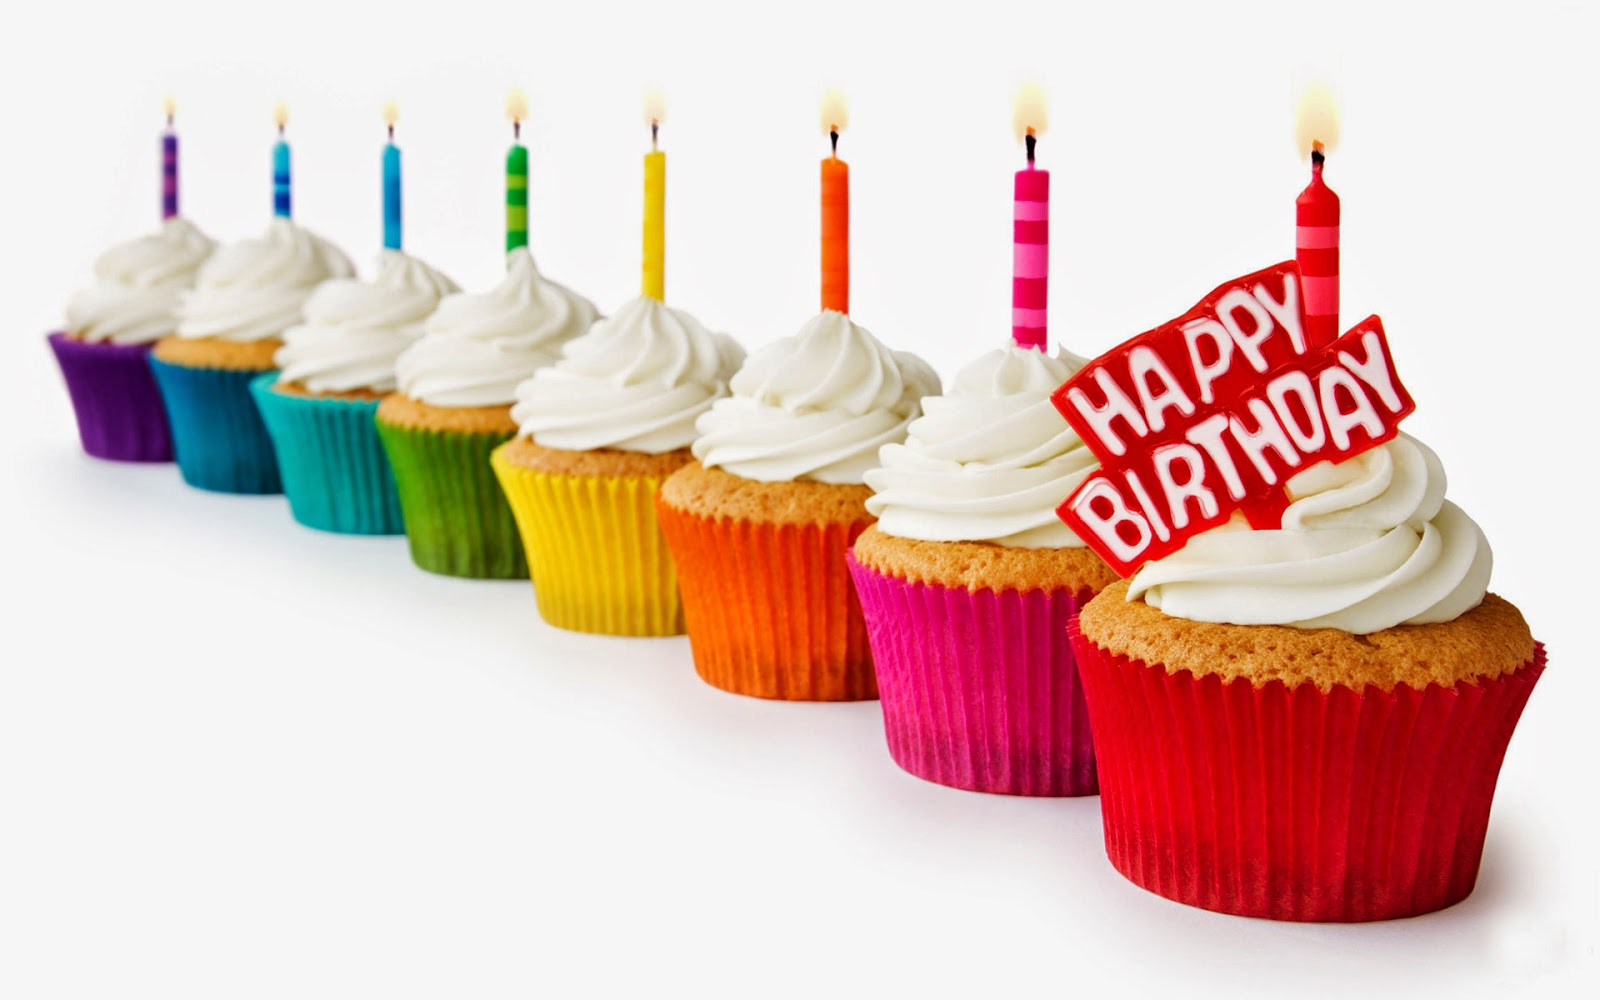 Happpppppppppy Birthday Dear Sanjeevji